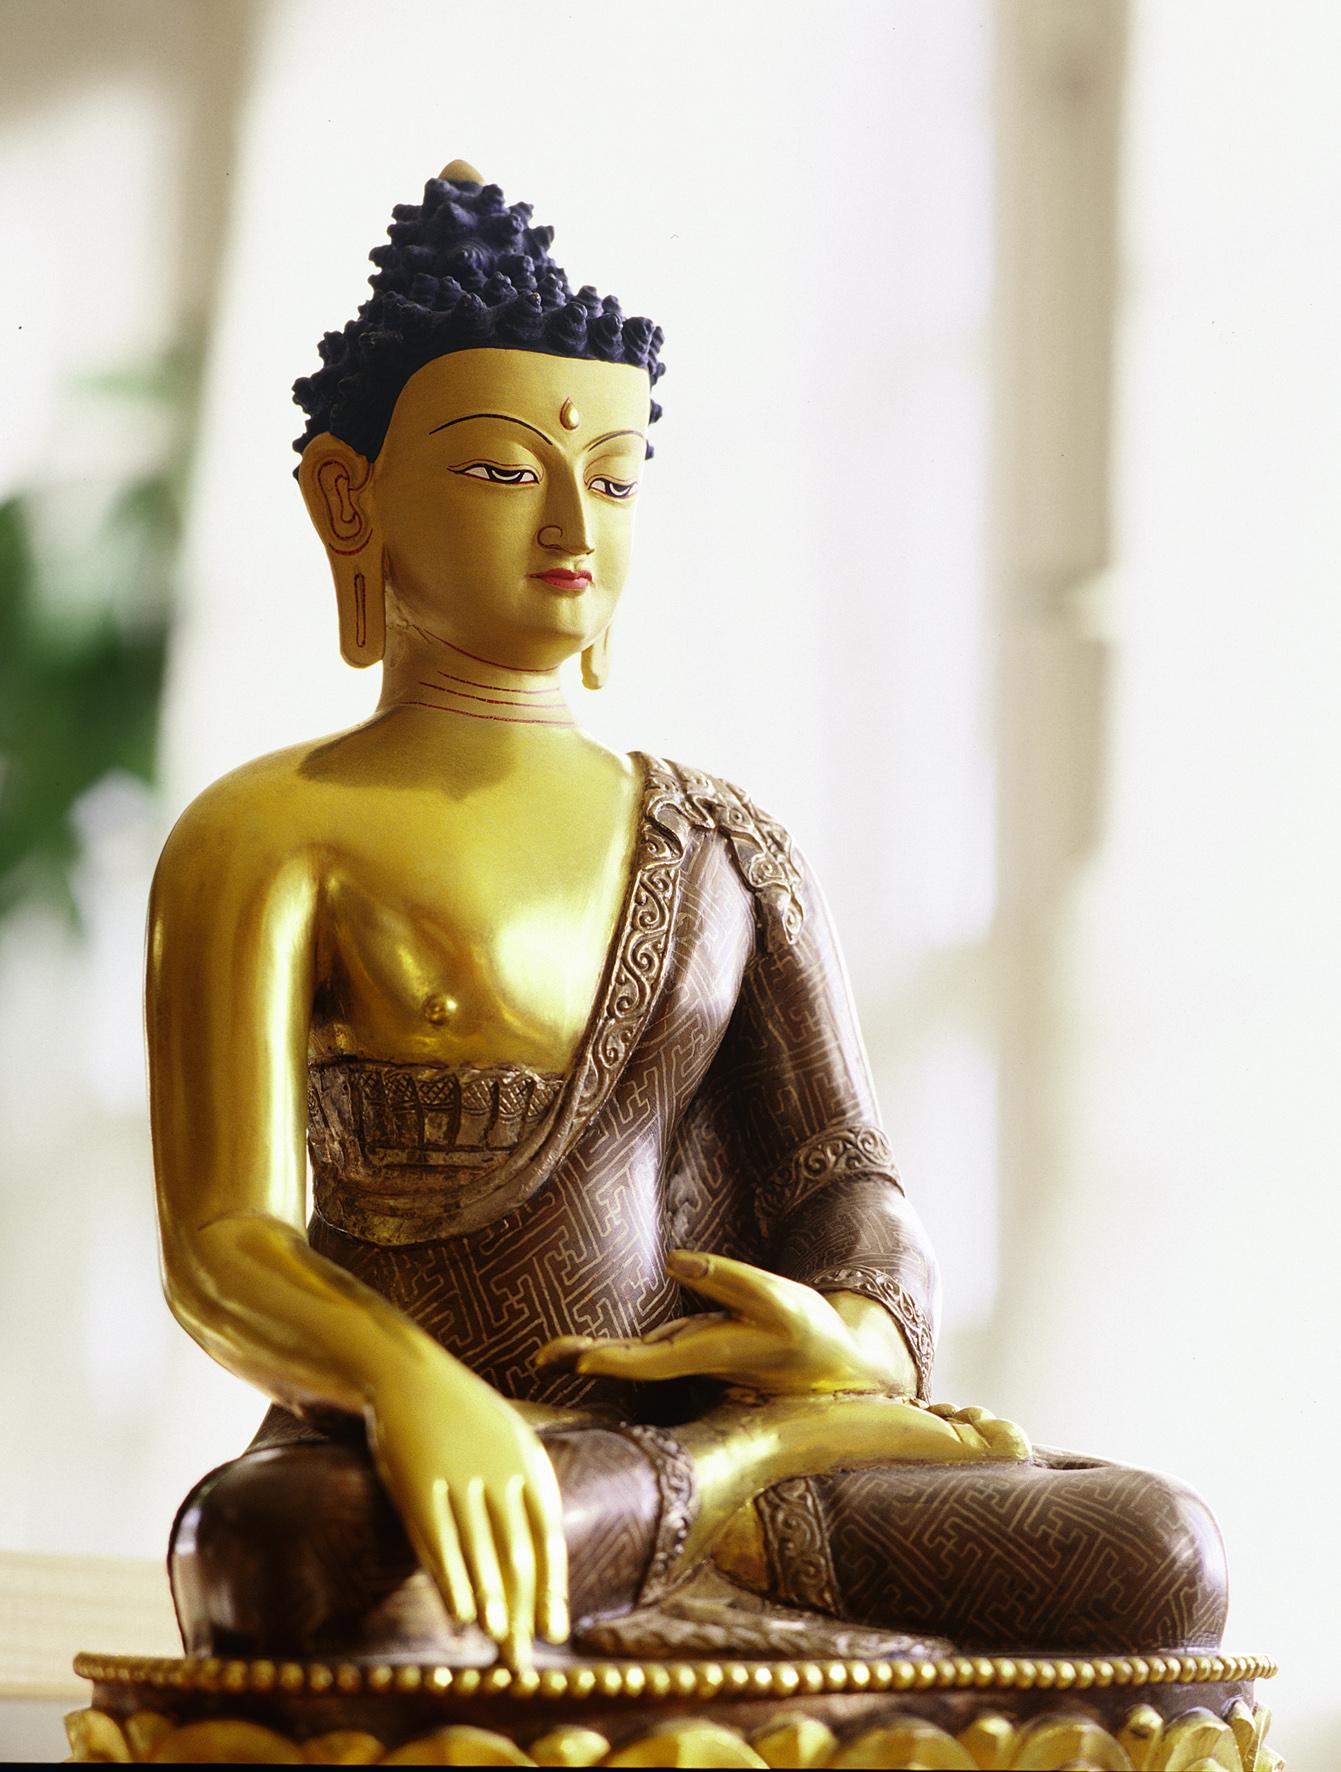 http://ambedkar.webs.com/Buddha/big_statue.jpg